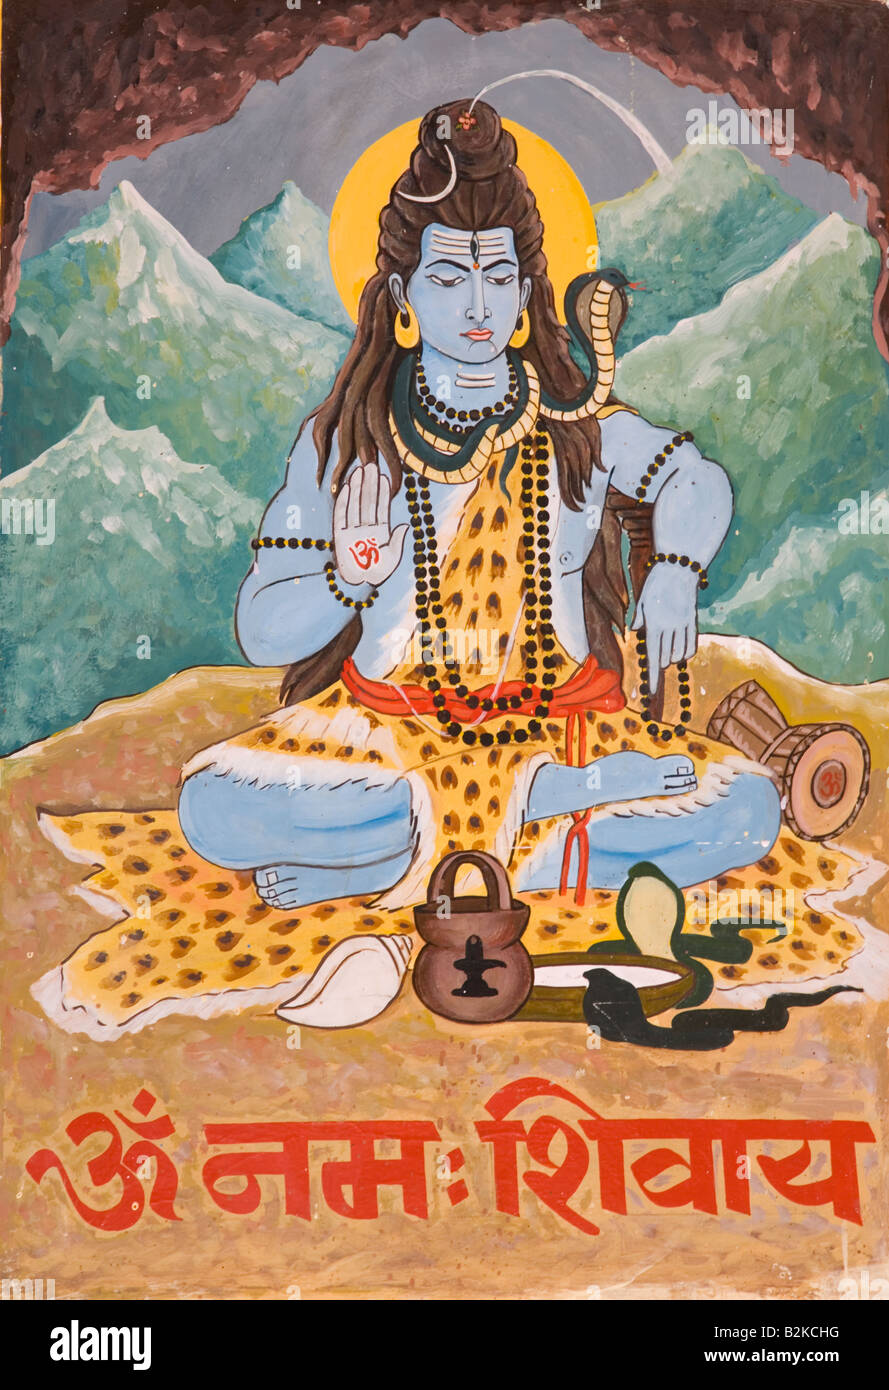 India Rajasthan Jaisalmer Lord Shiva sign 2008 - Stock Image